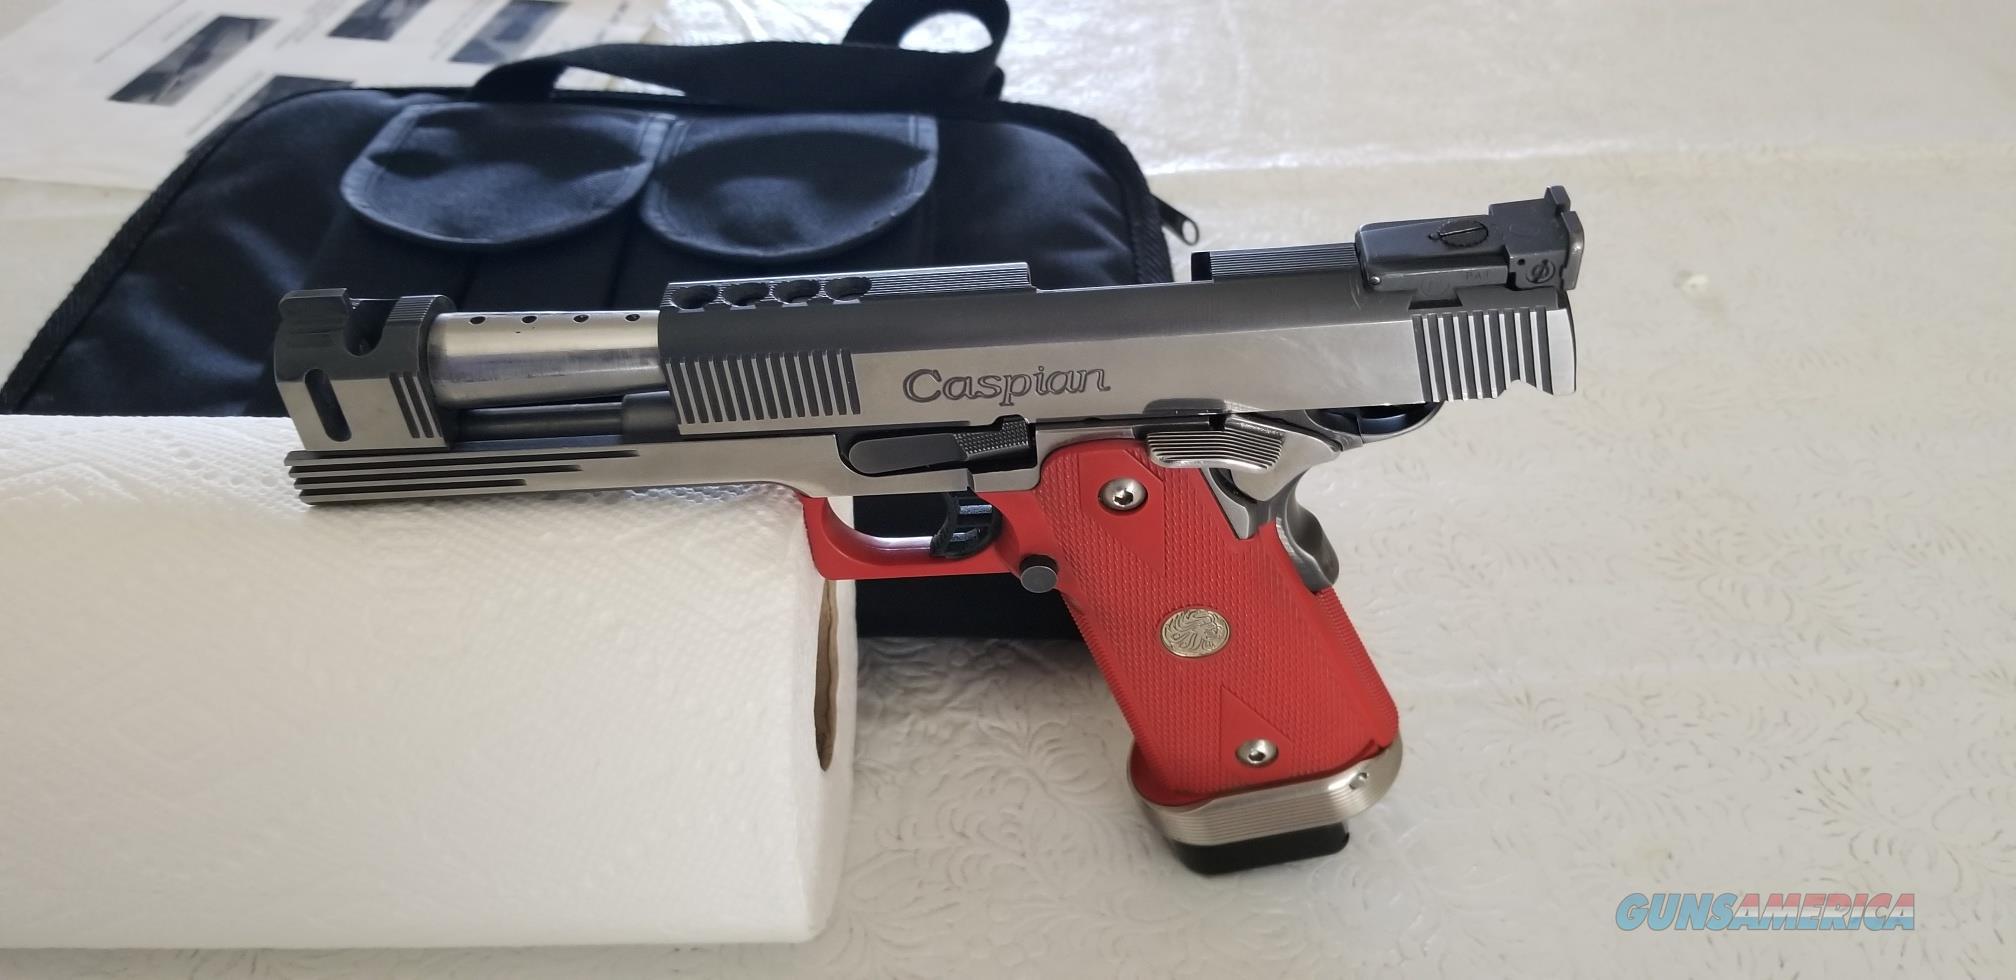 Caspian 1911   Guns > Pistols > 1911 Pistol Copies (non-Colt)